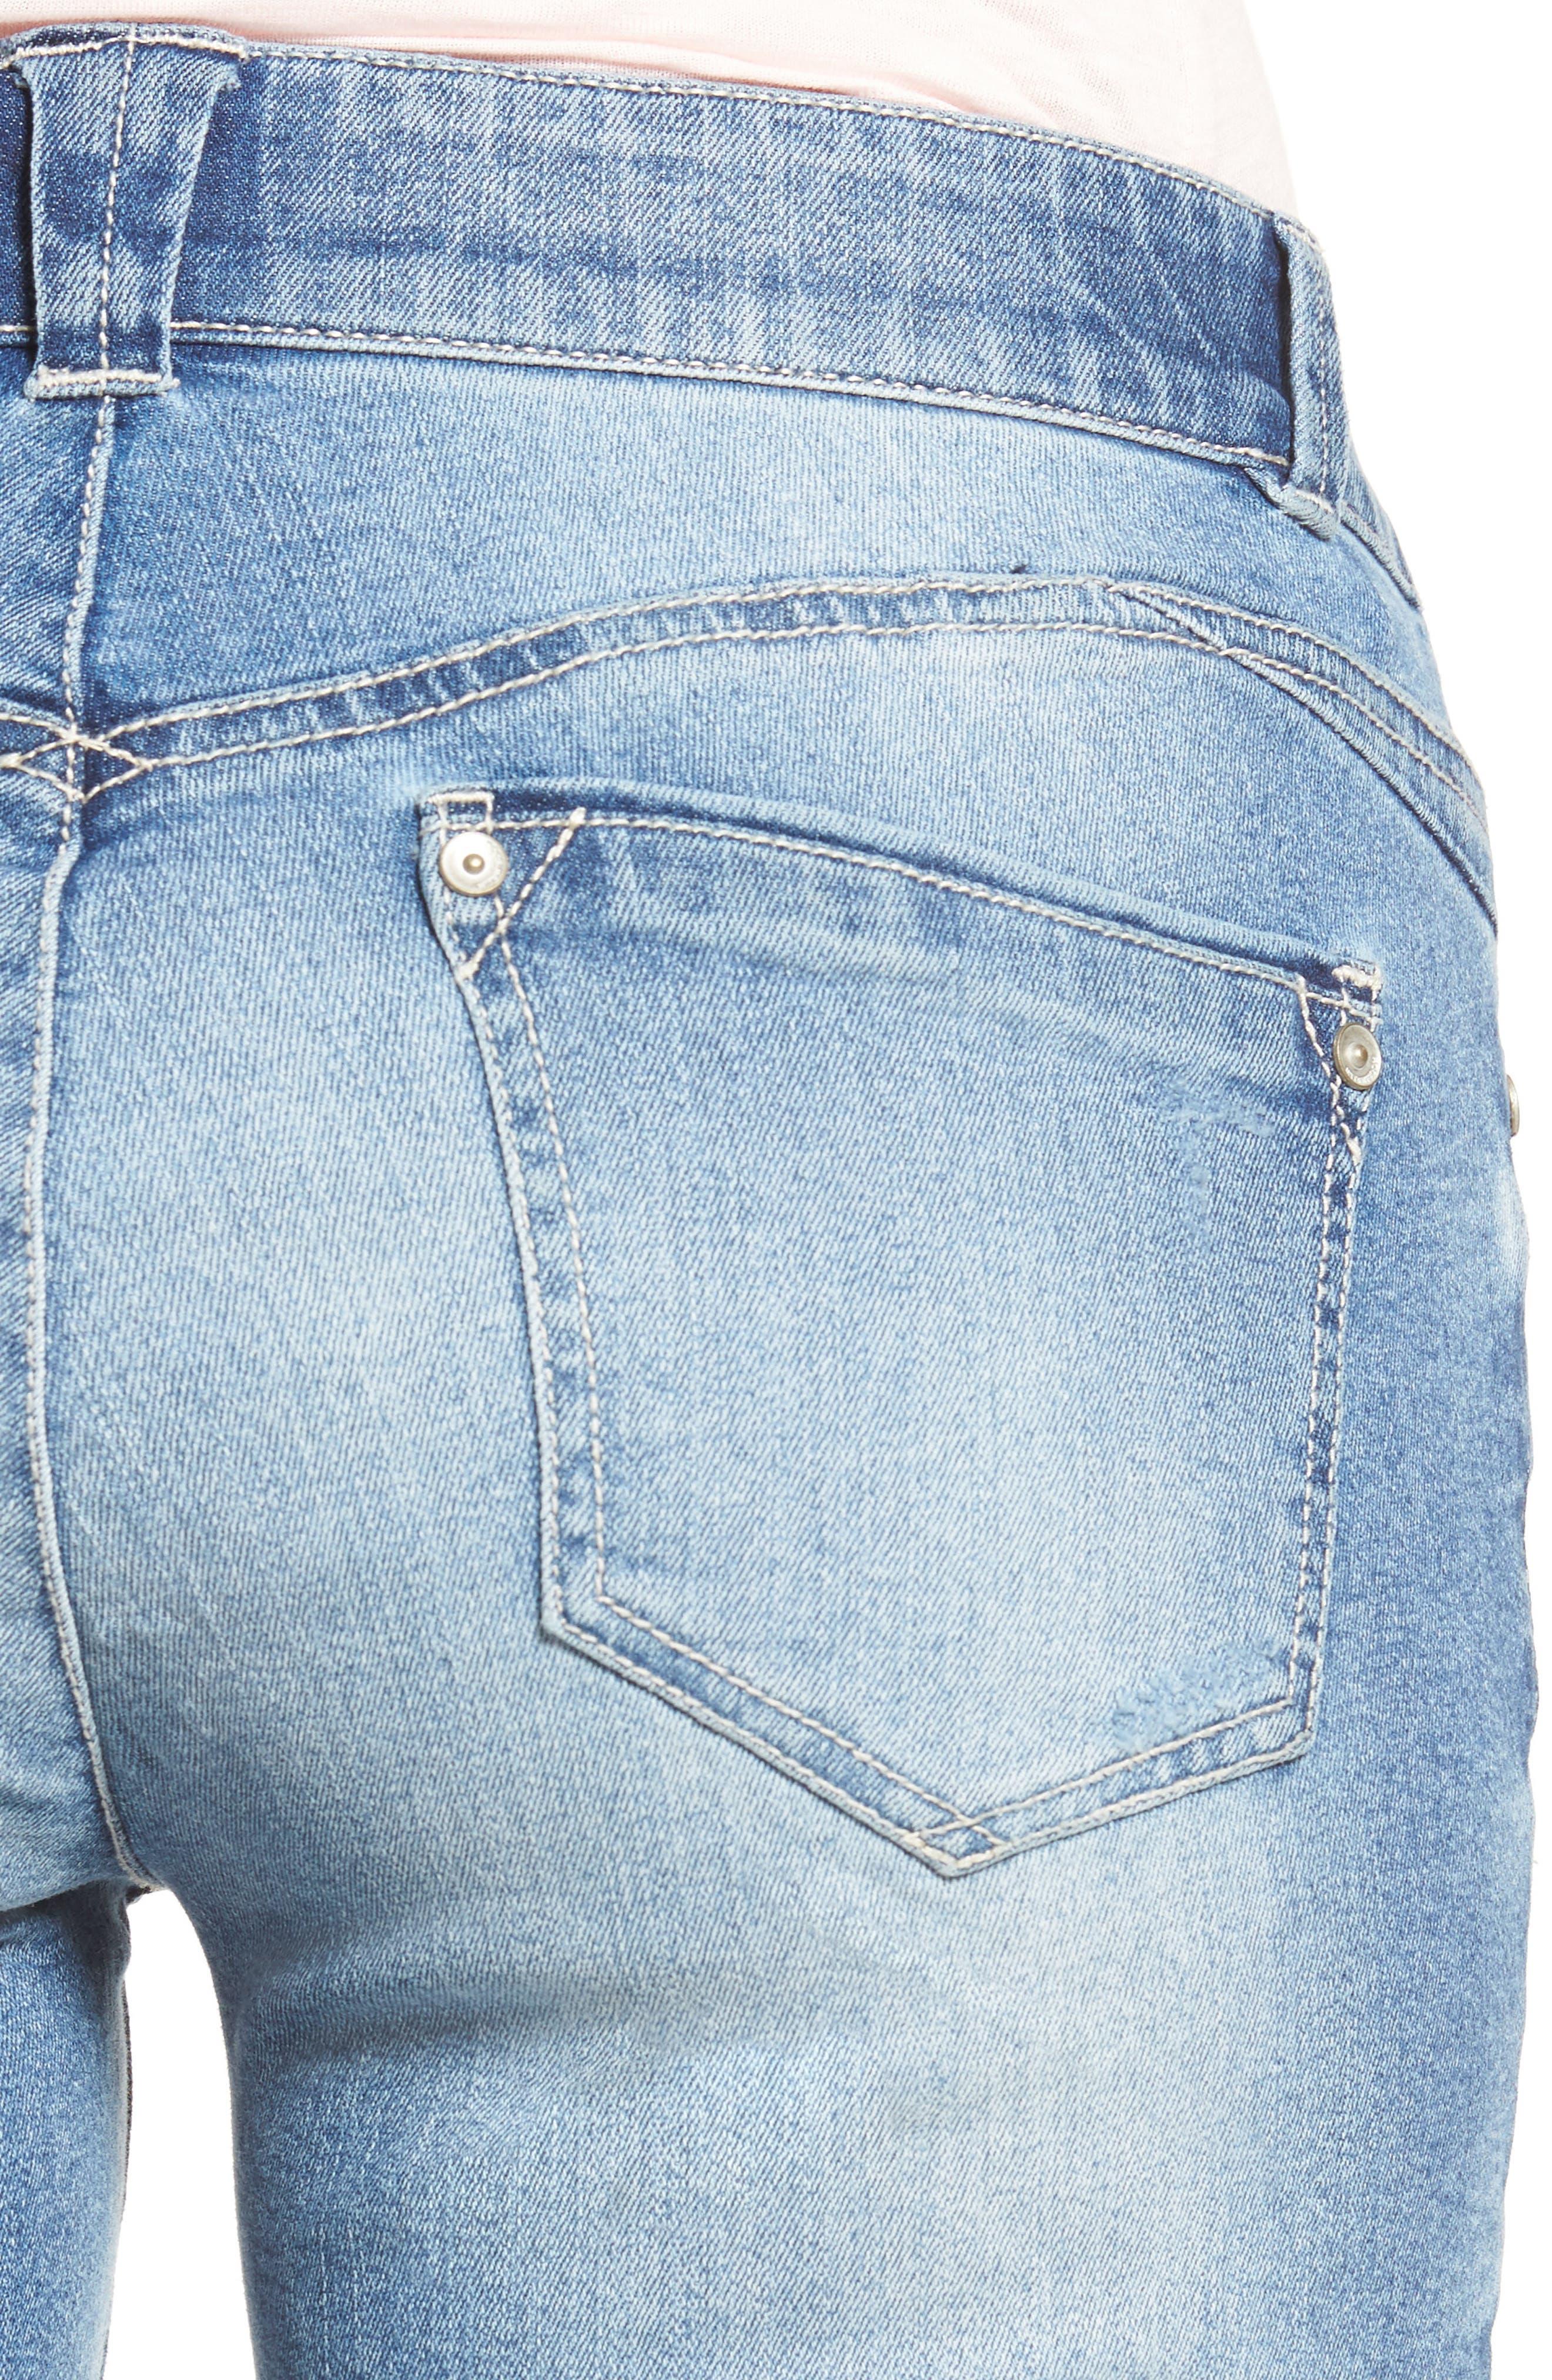 Alternate Image 4  - Wit & Wisdom Ab-solution Ripped Denim Bermuda Shorts (Regular & Petite) (Nordstrom Exclusive)